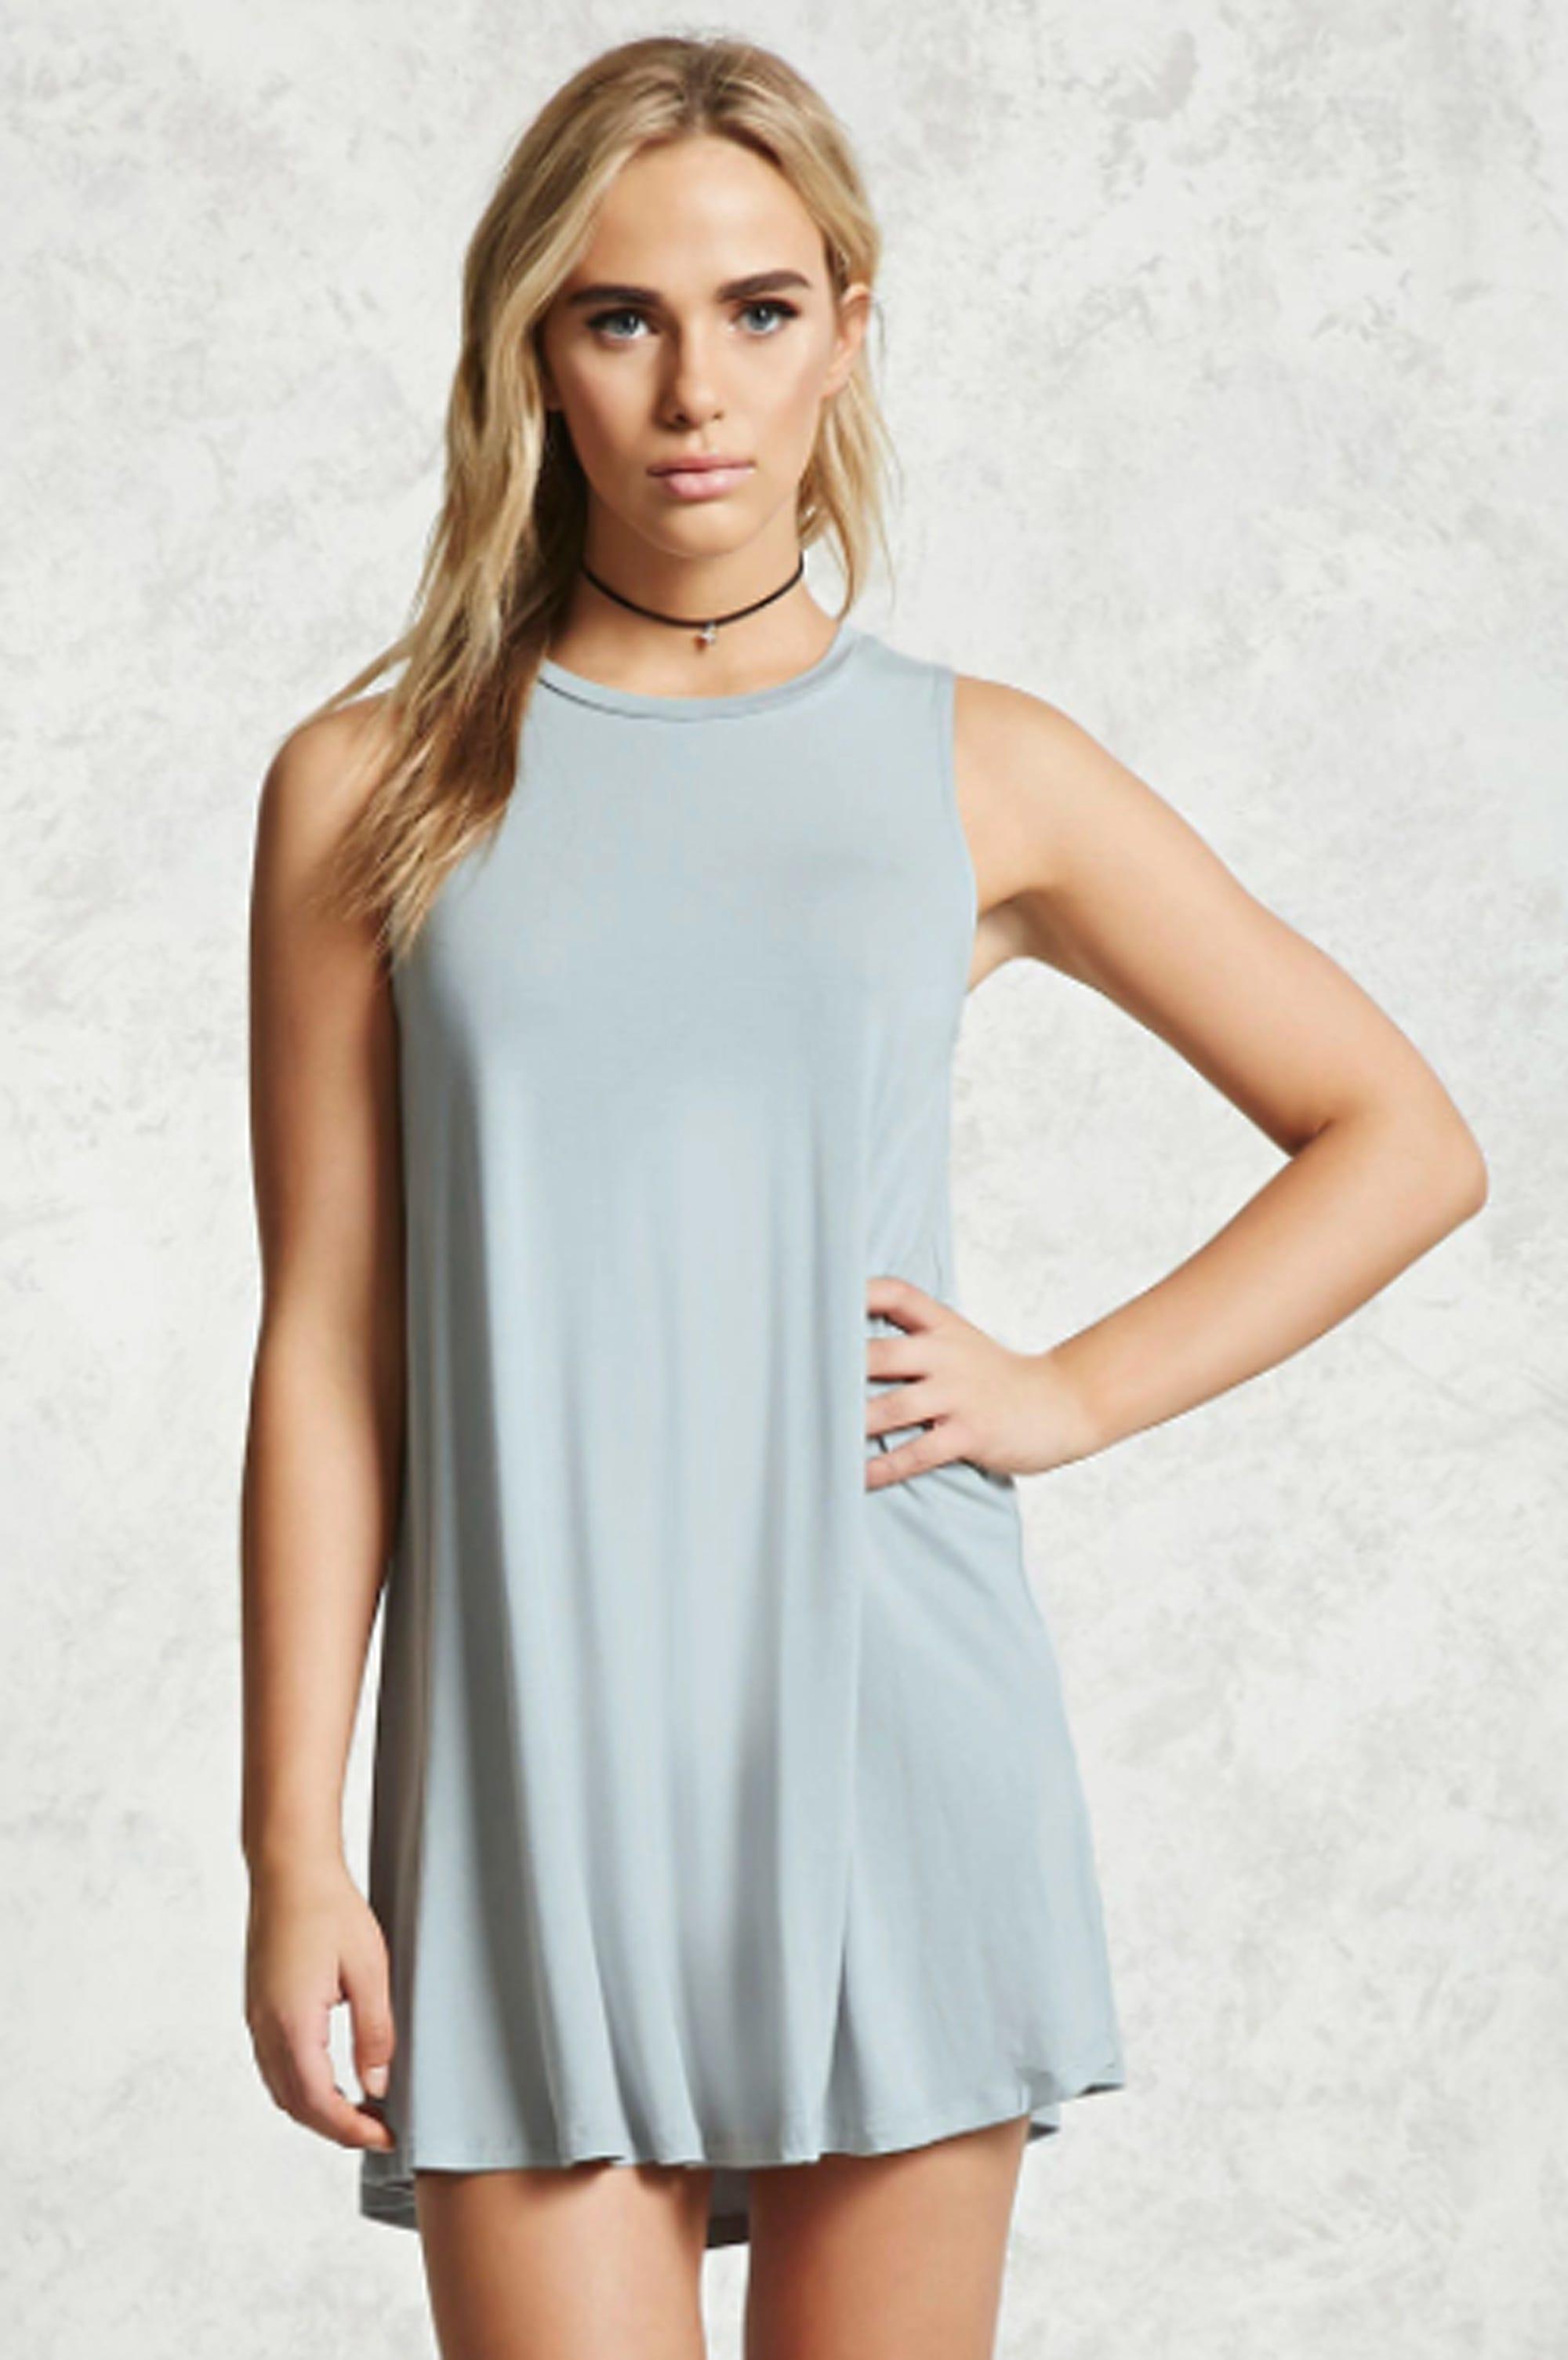 Lauren Conrad Favorite Forever 21 Dress Under 10 Dollar